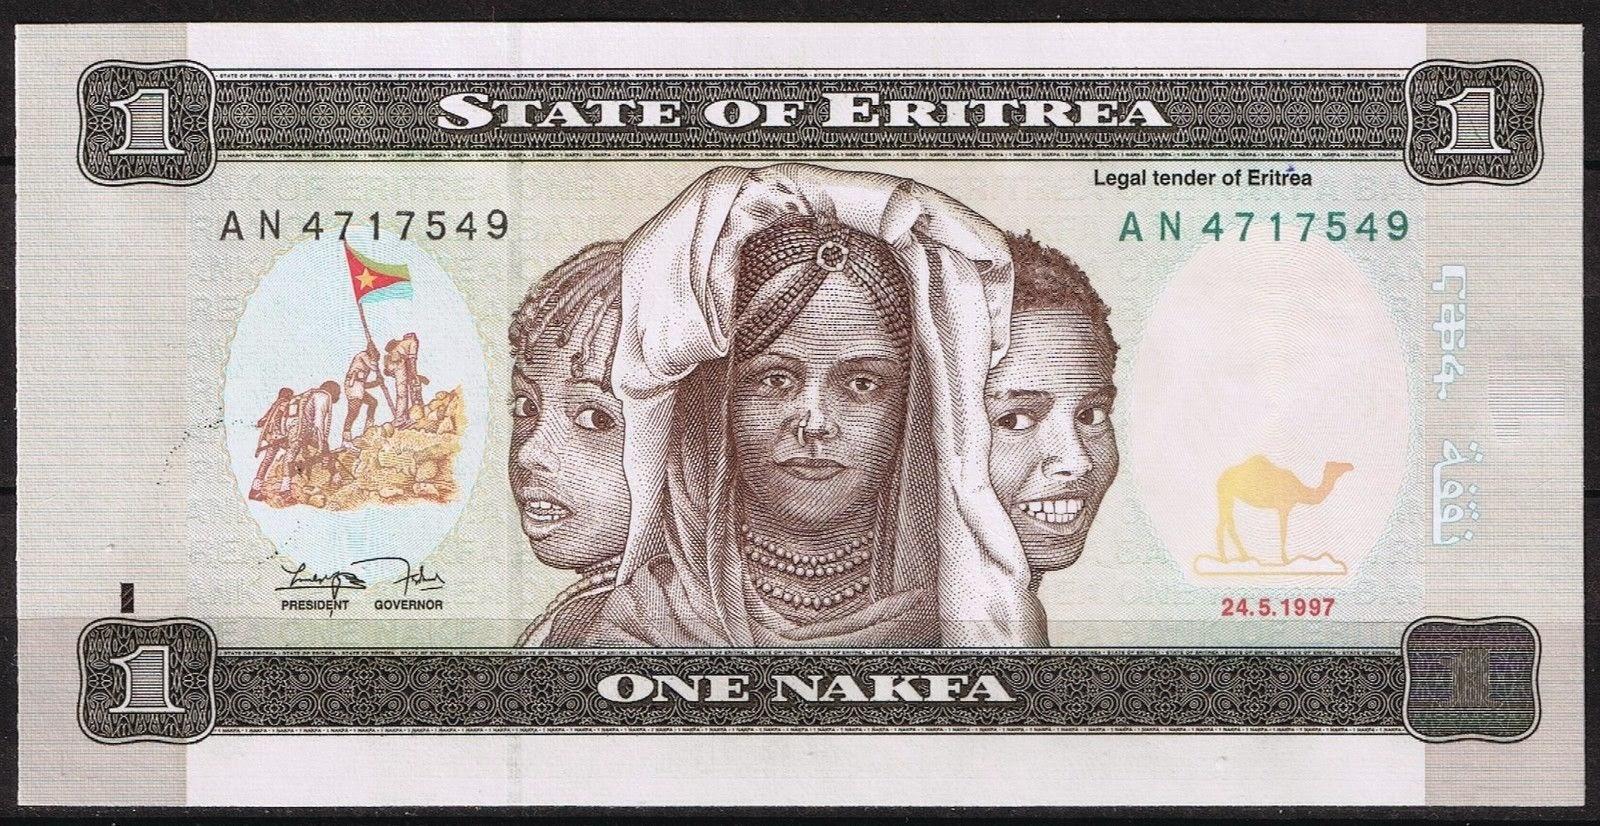 Eritrea banknotes one Eritrean nakfa note